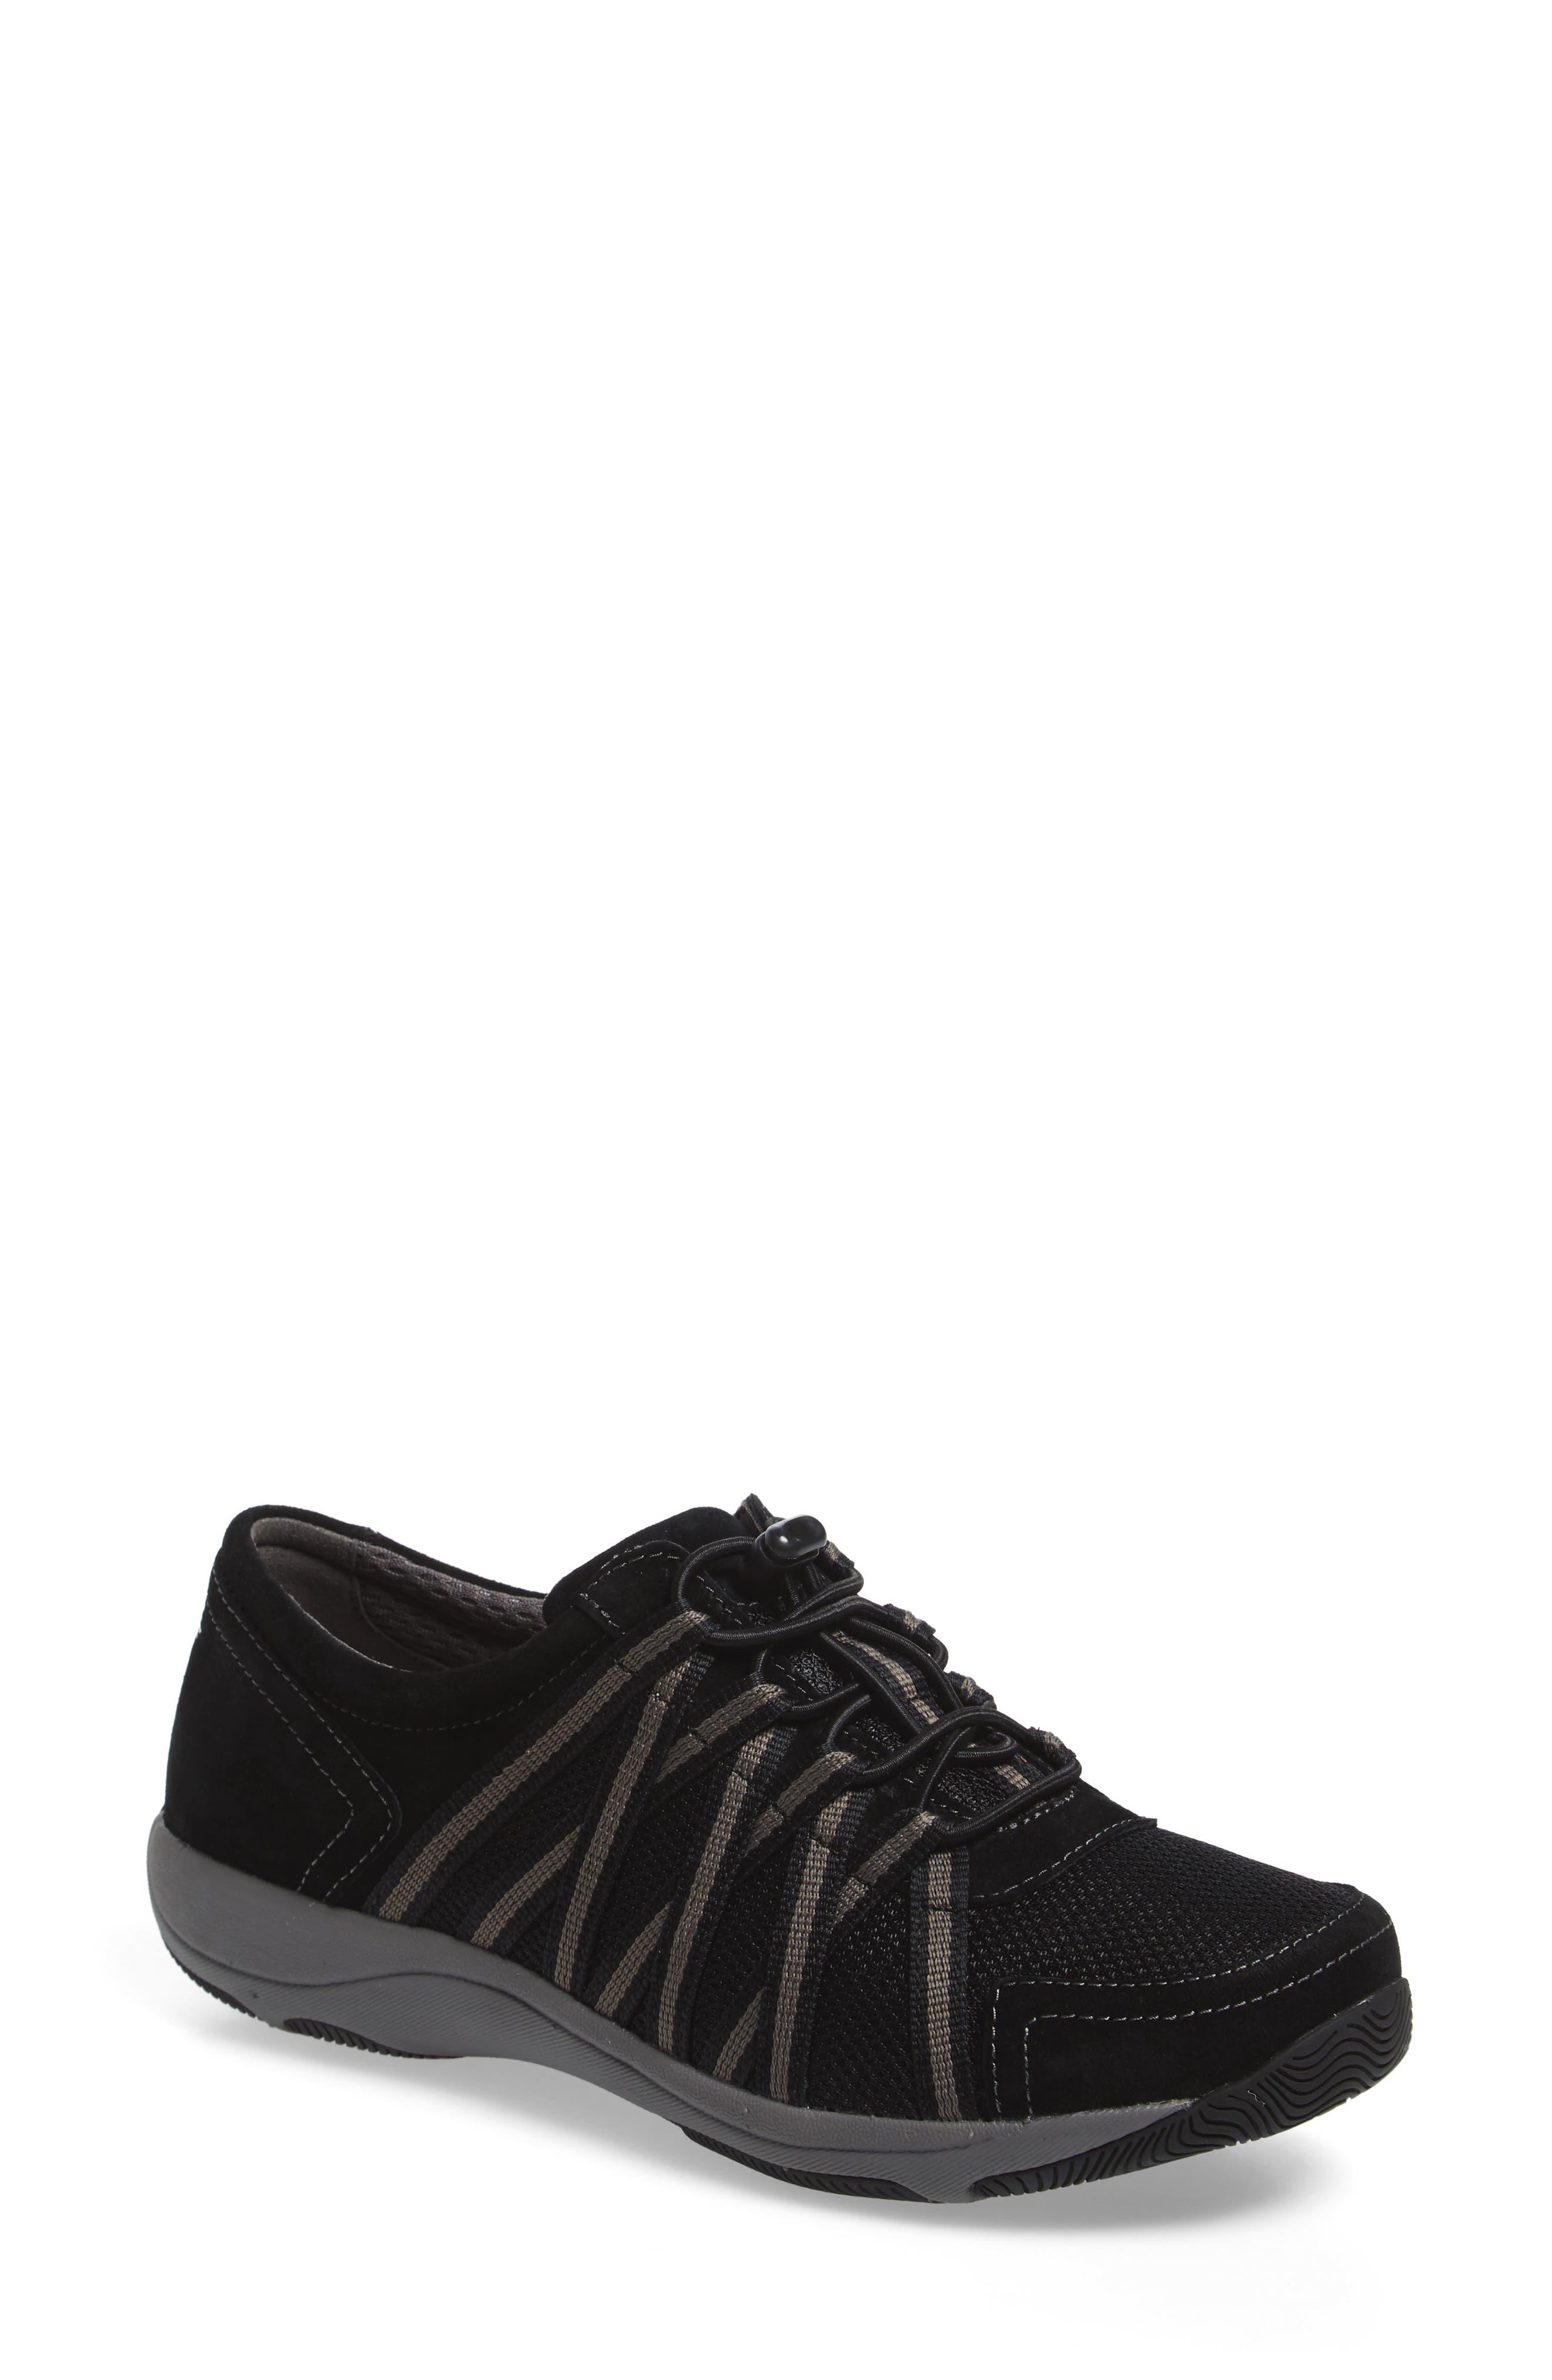 Halifax Collection Honor Sneaker,                         Main,                         color, BLACK/ BLACK SUEDE